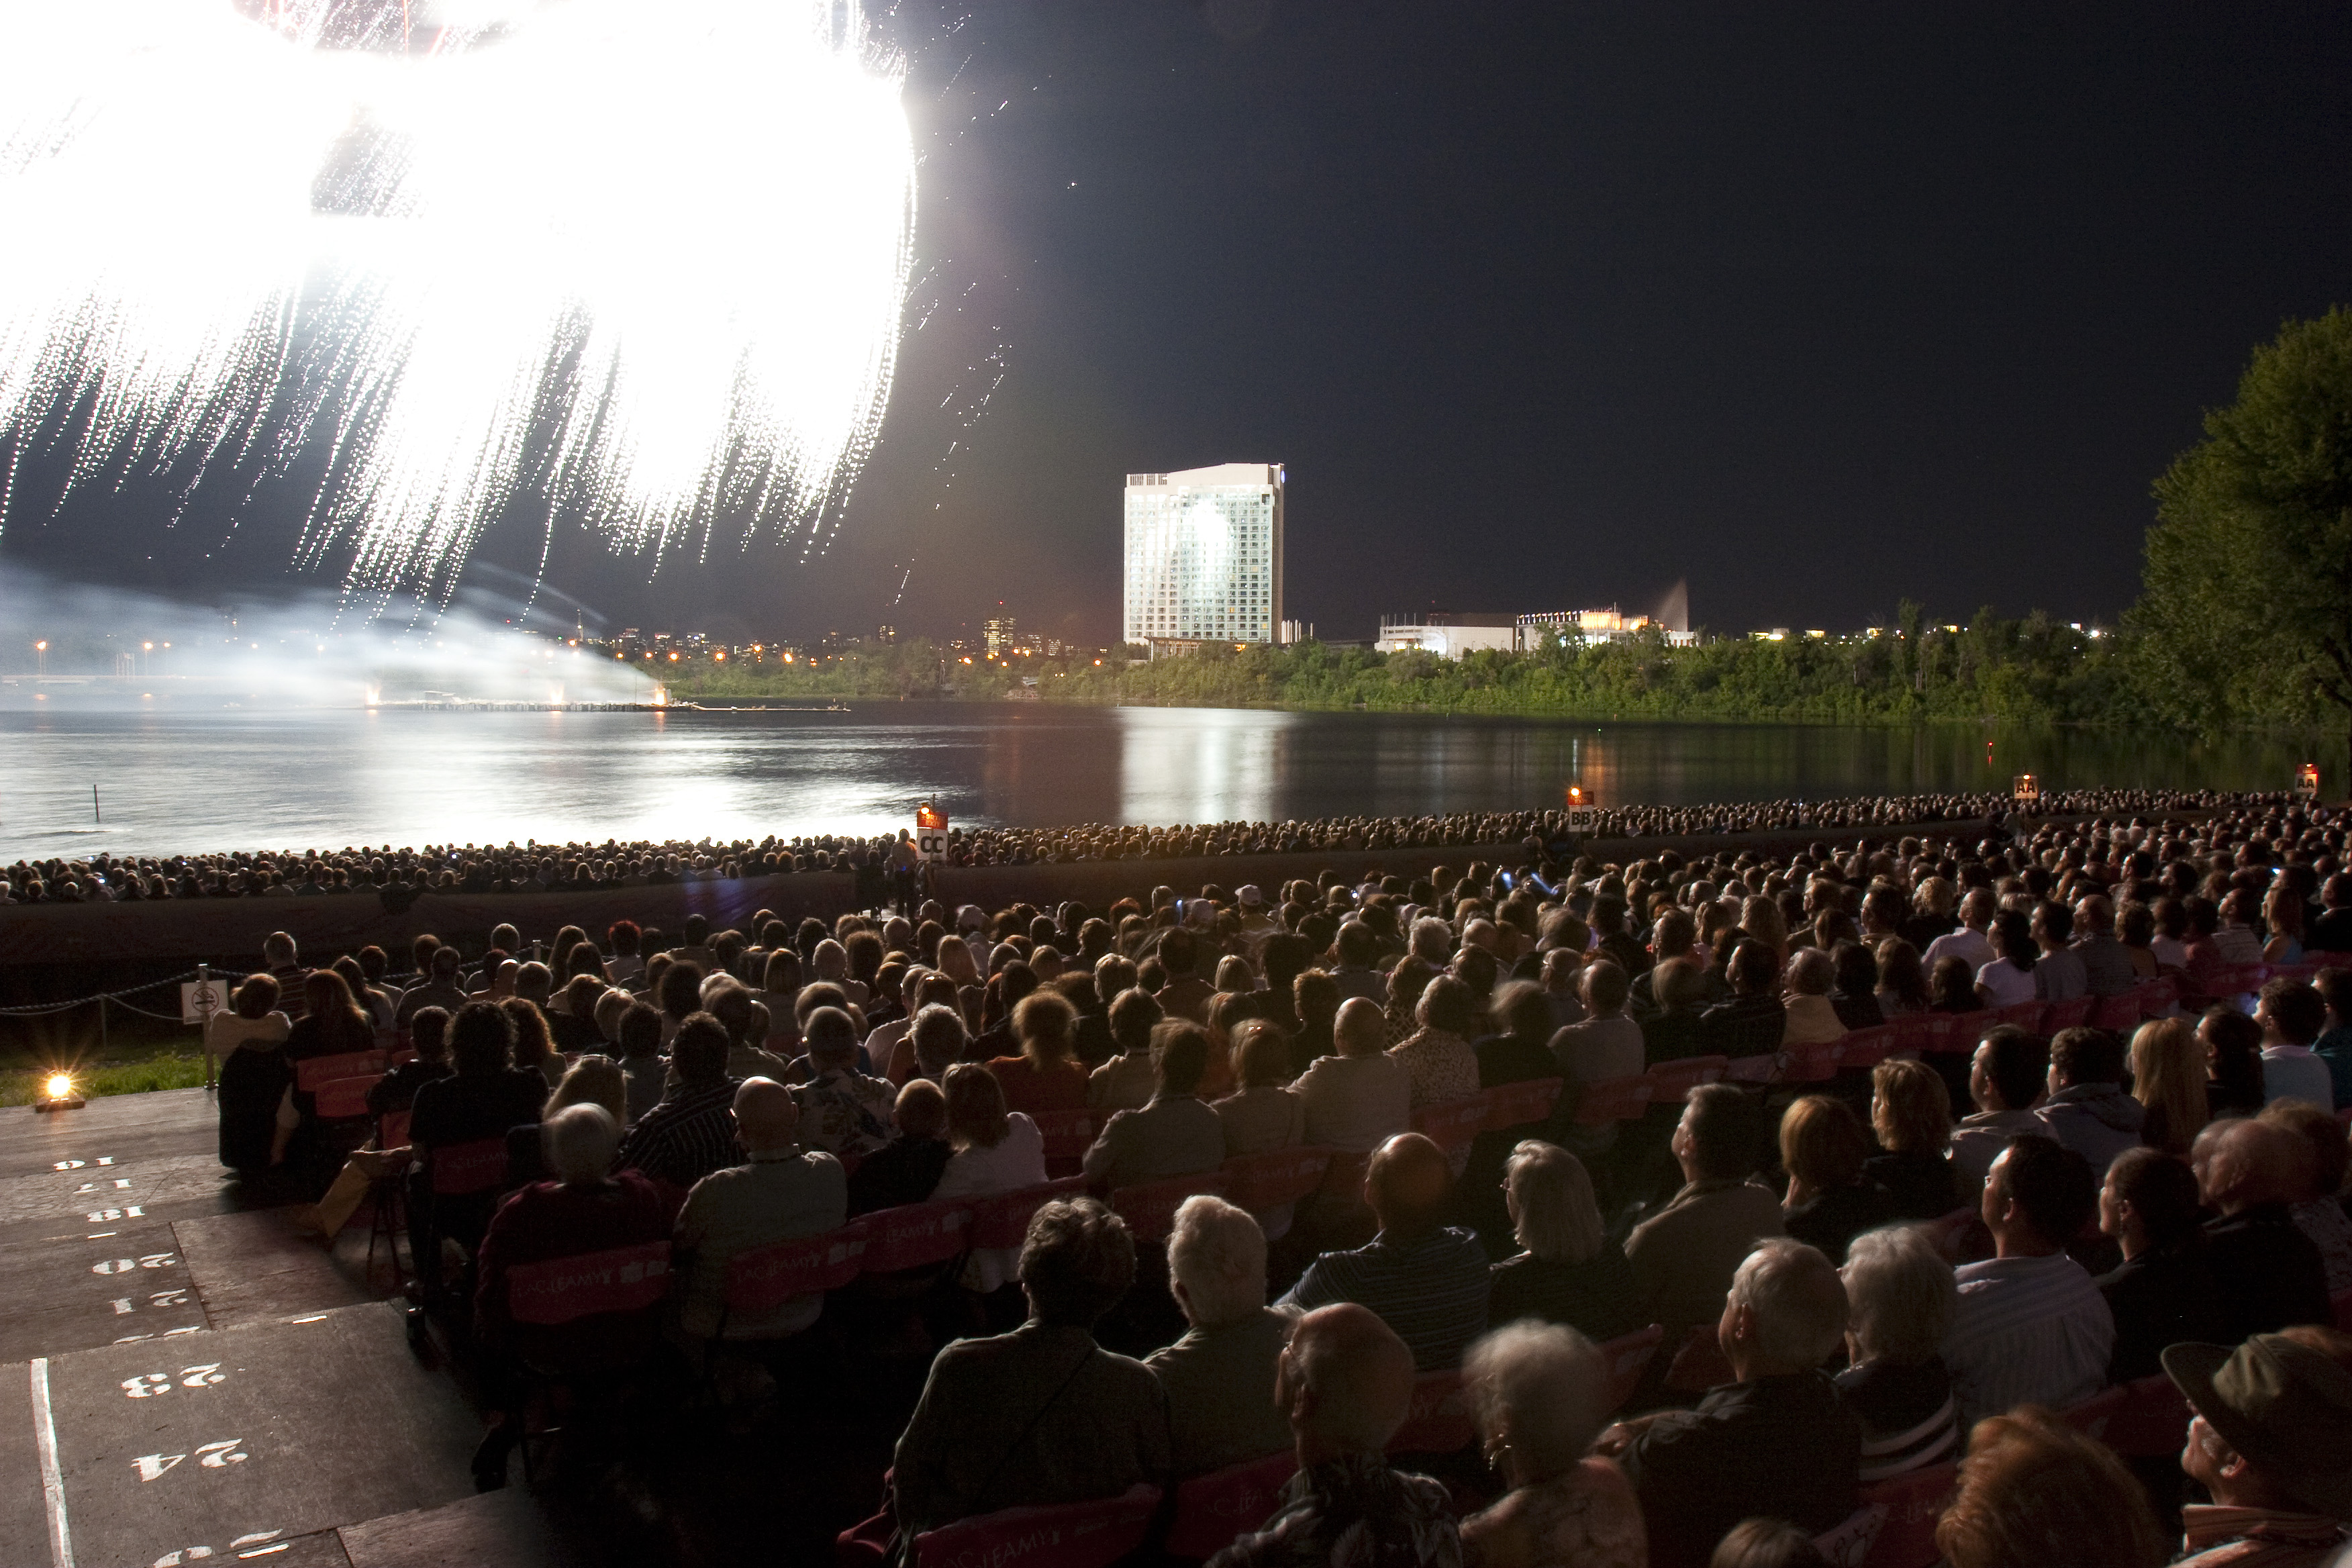 Casino du lac leamy fireworks tropicana express casino laughlin employment oppertunities